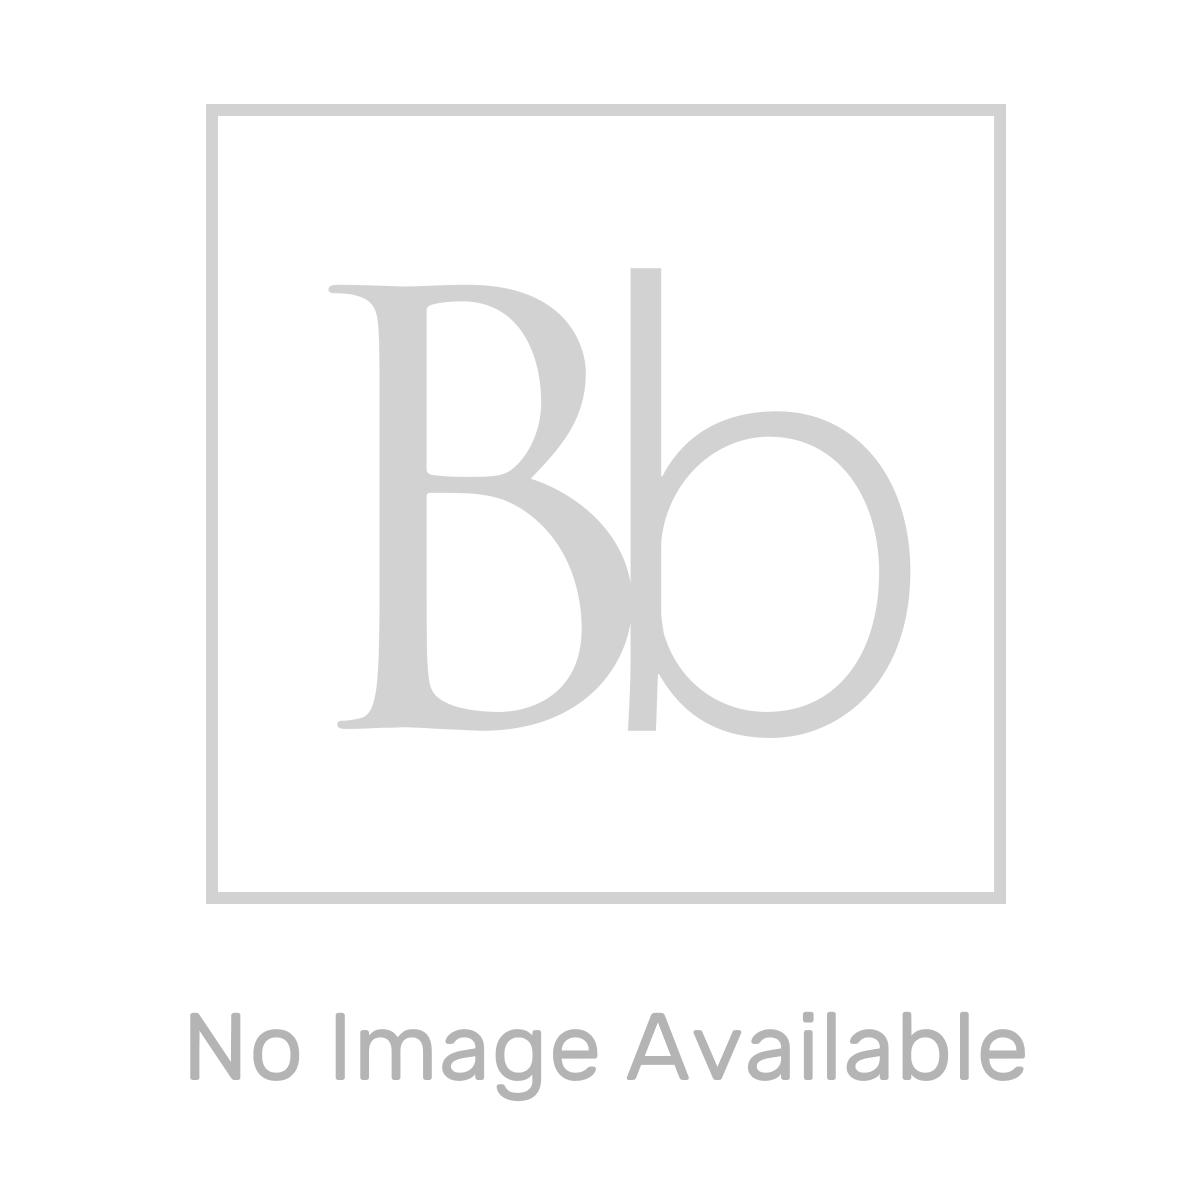 Aquadart White Slate Shower Tray 1400 x 800 Lifestyle